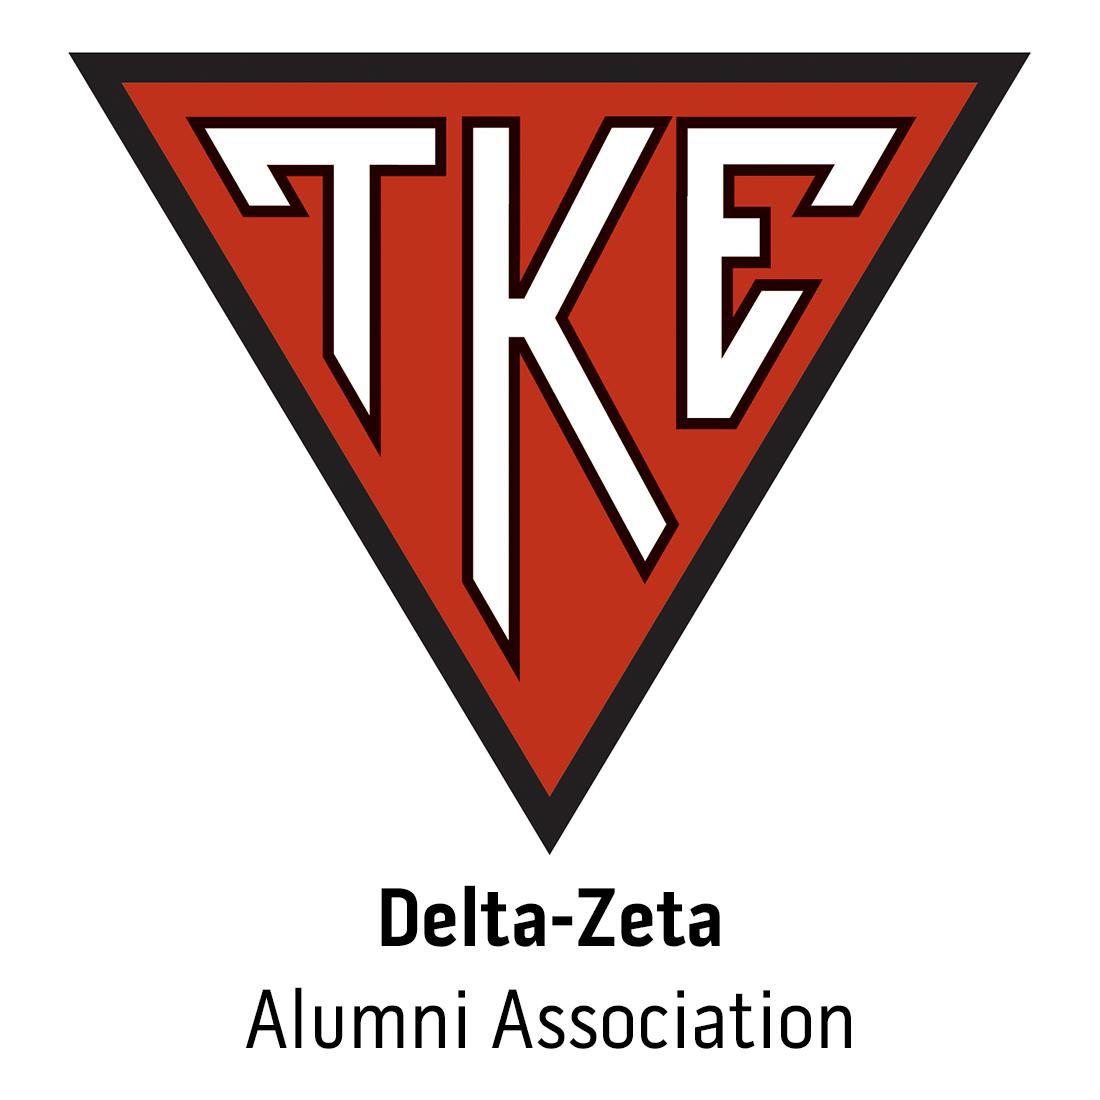 Delta-Zeta Alumni Association at Southeast Missouri State University